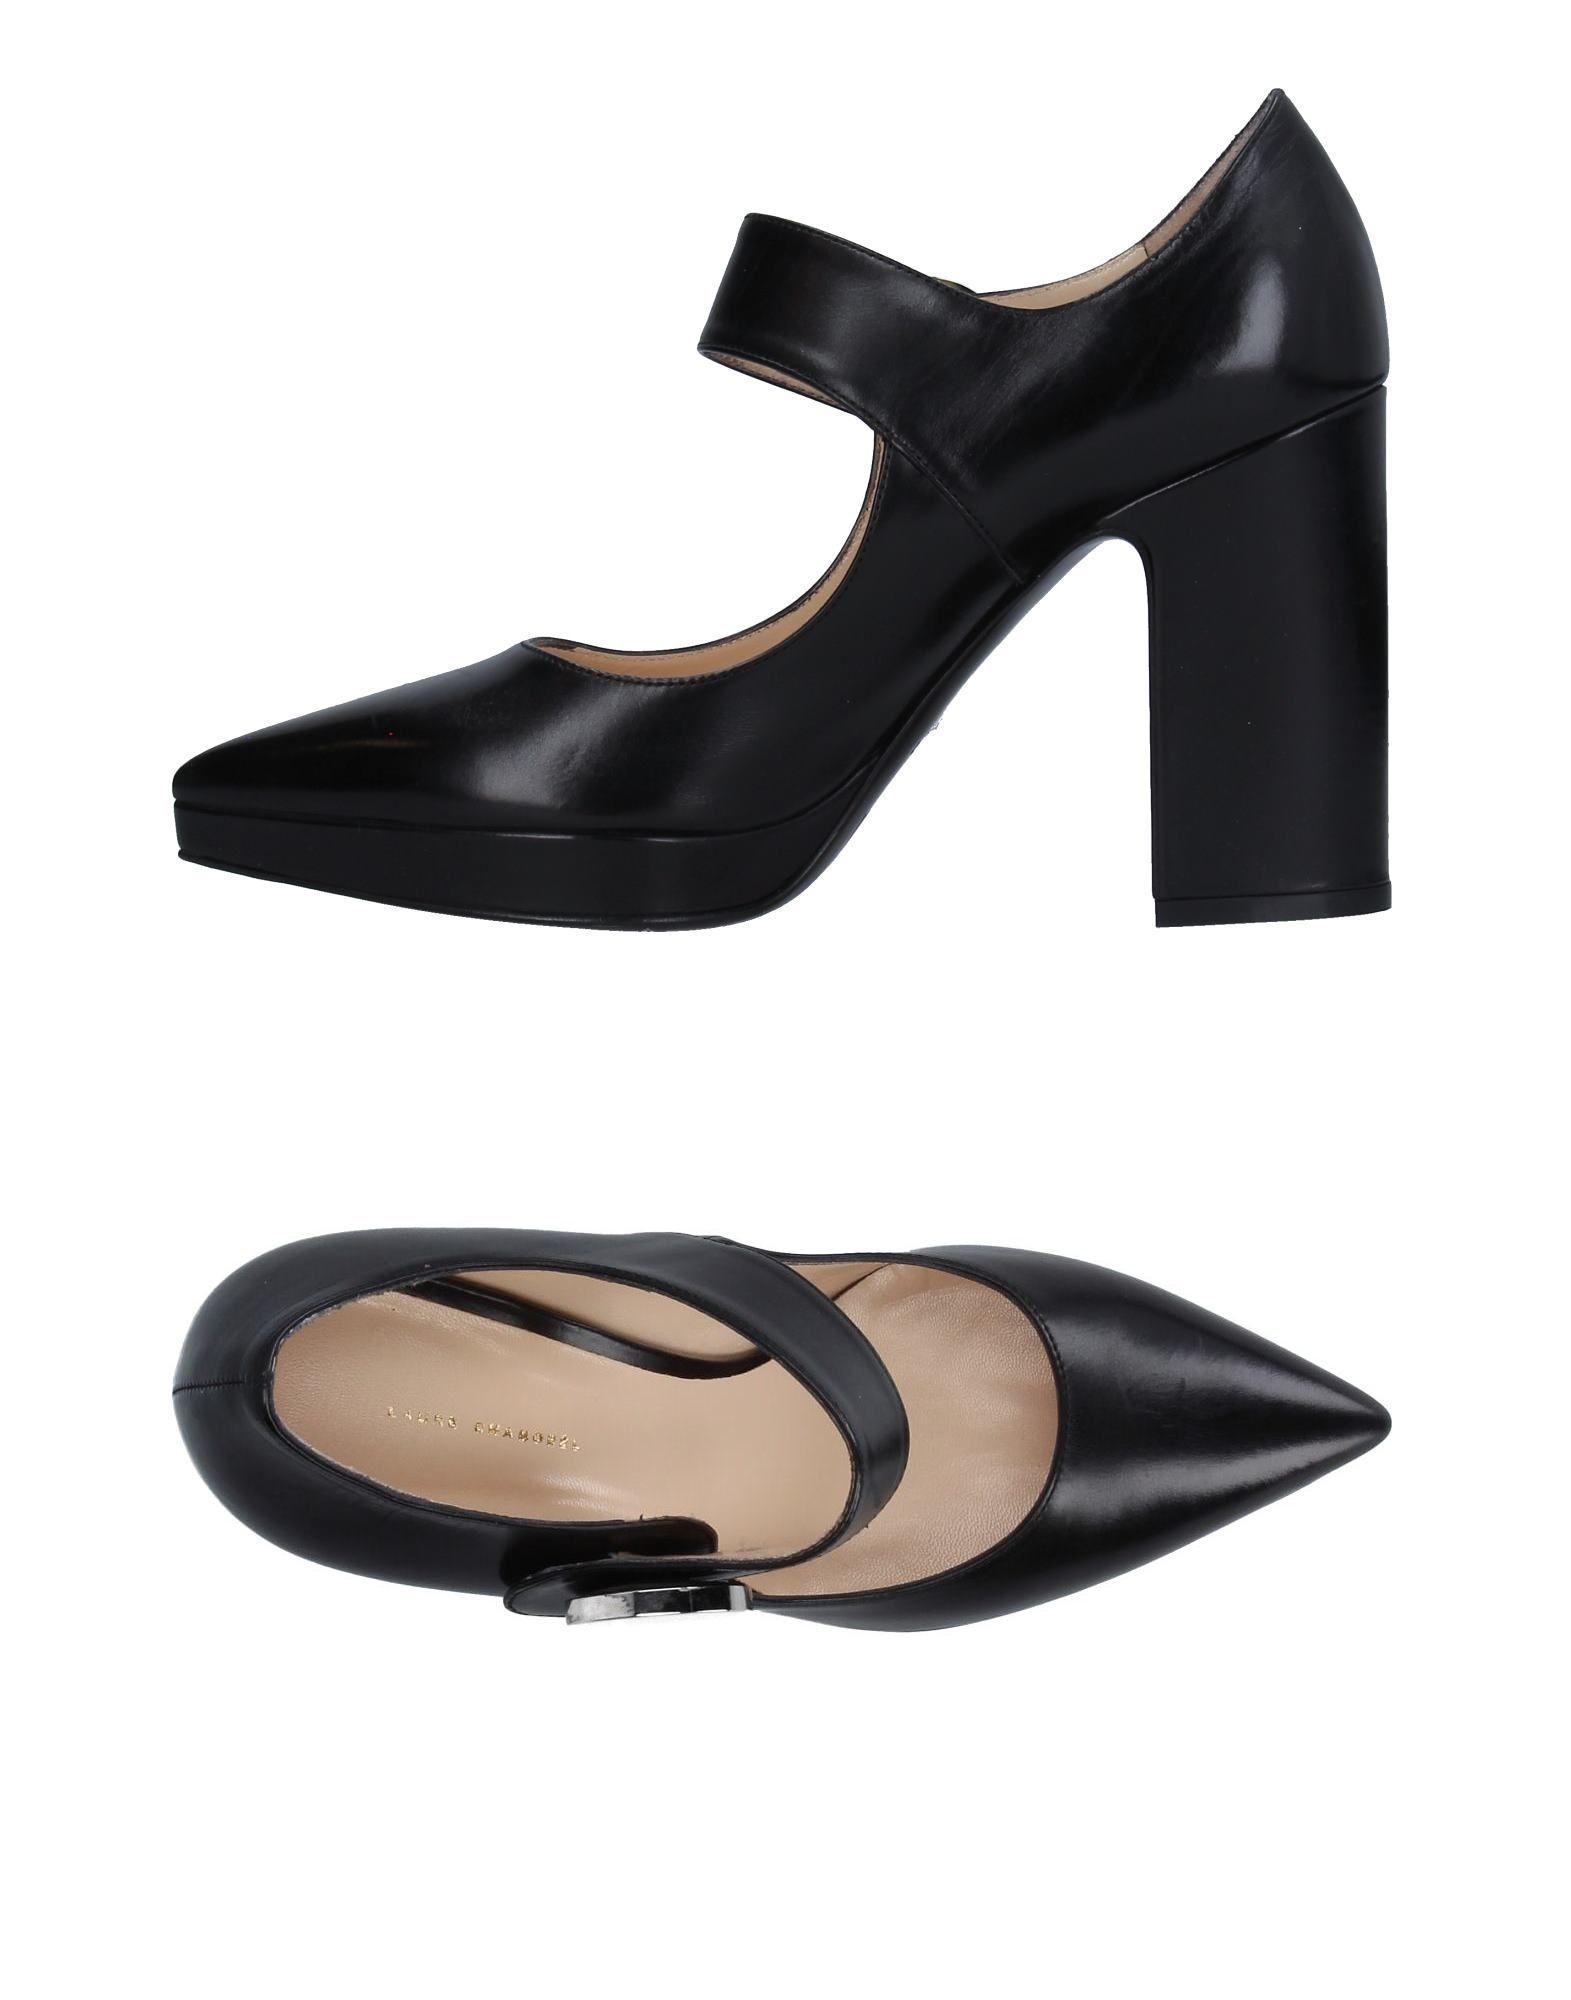 Stilvolle billige Schuhe Laure Chamorel Pumps Damen  11256301HT